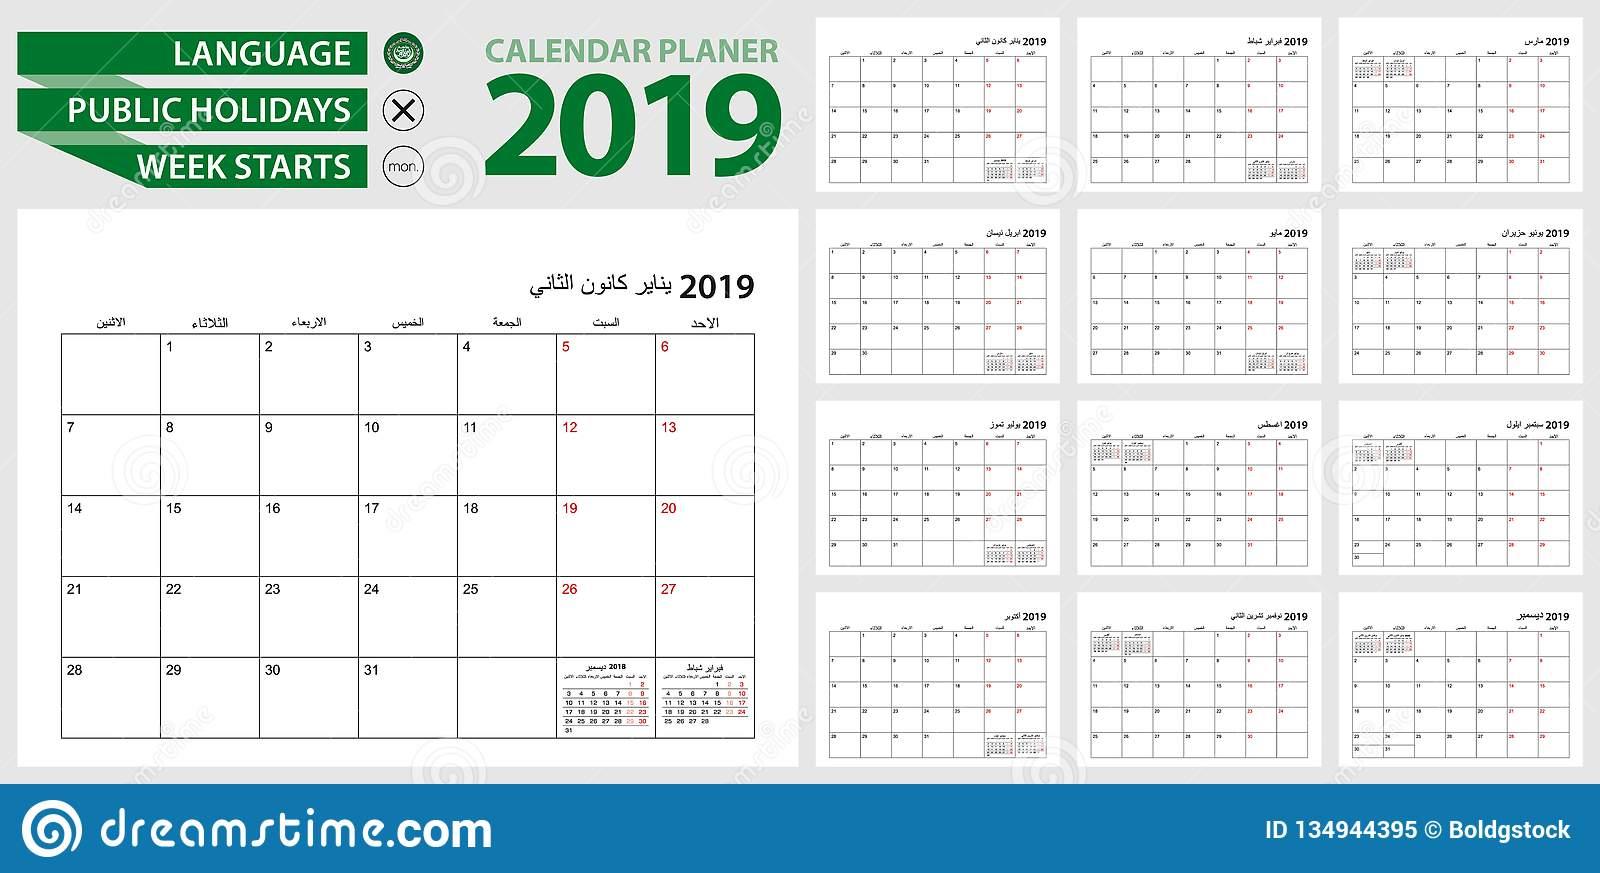 Arabic Calendar Planner For 2019. Arabic Language, Week